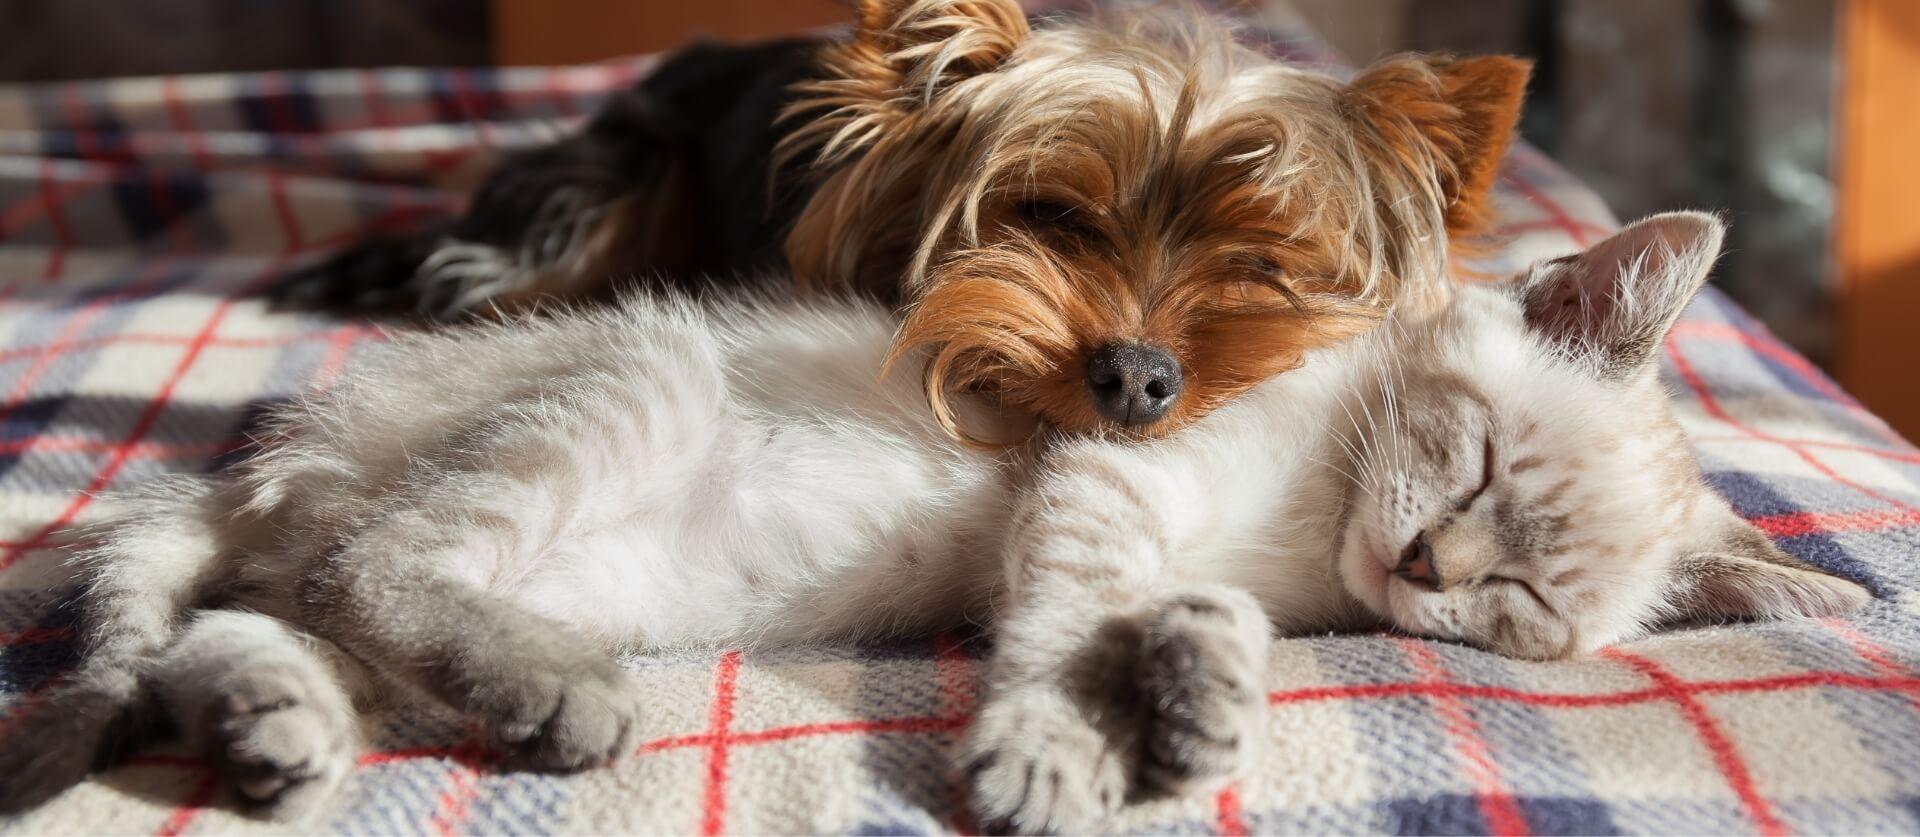 Dog Groomer With Dog